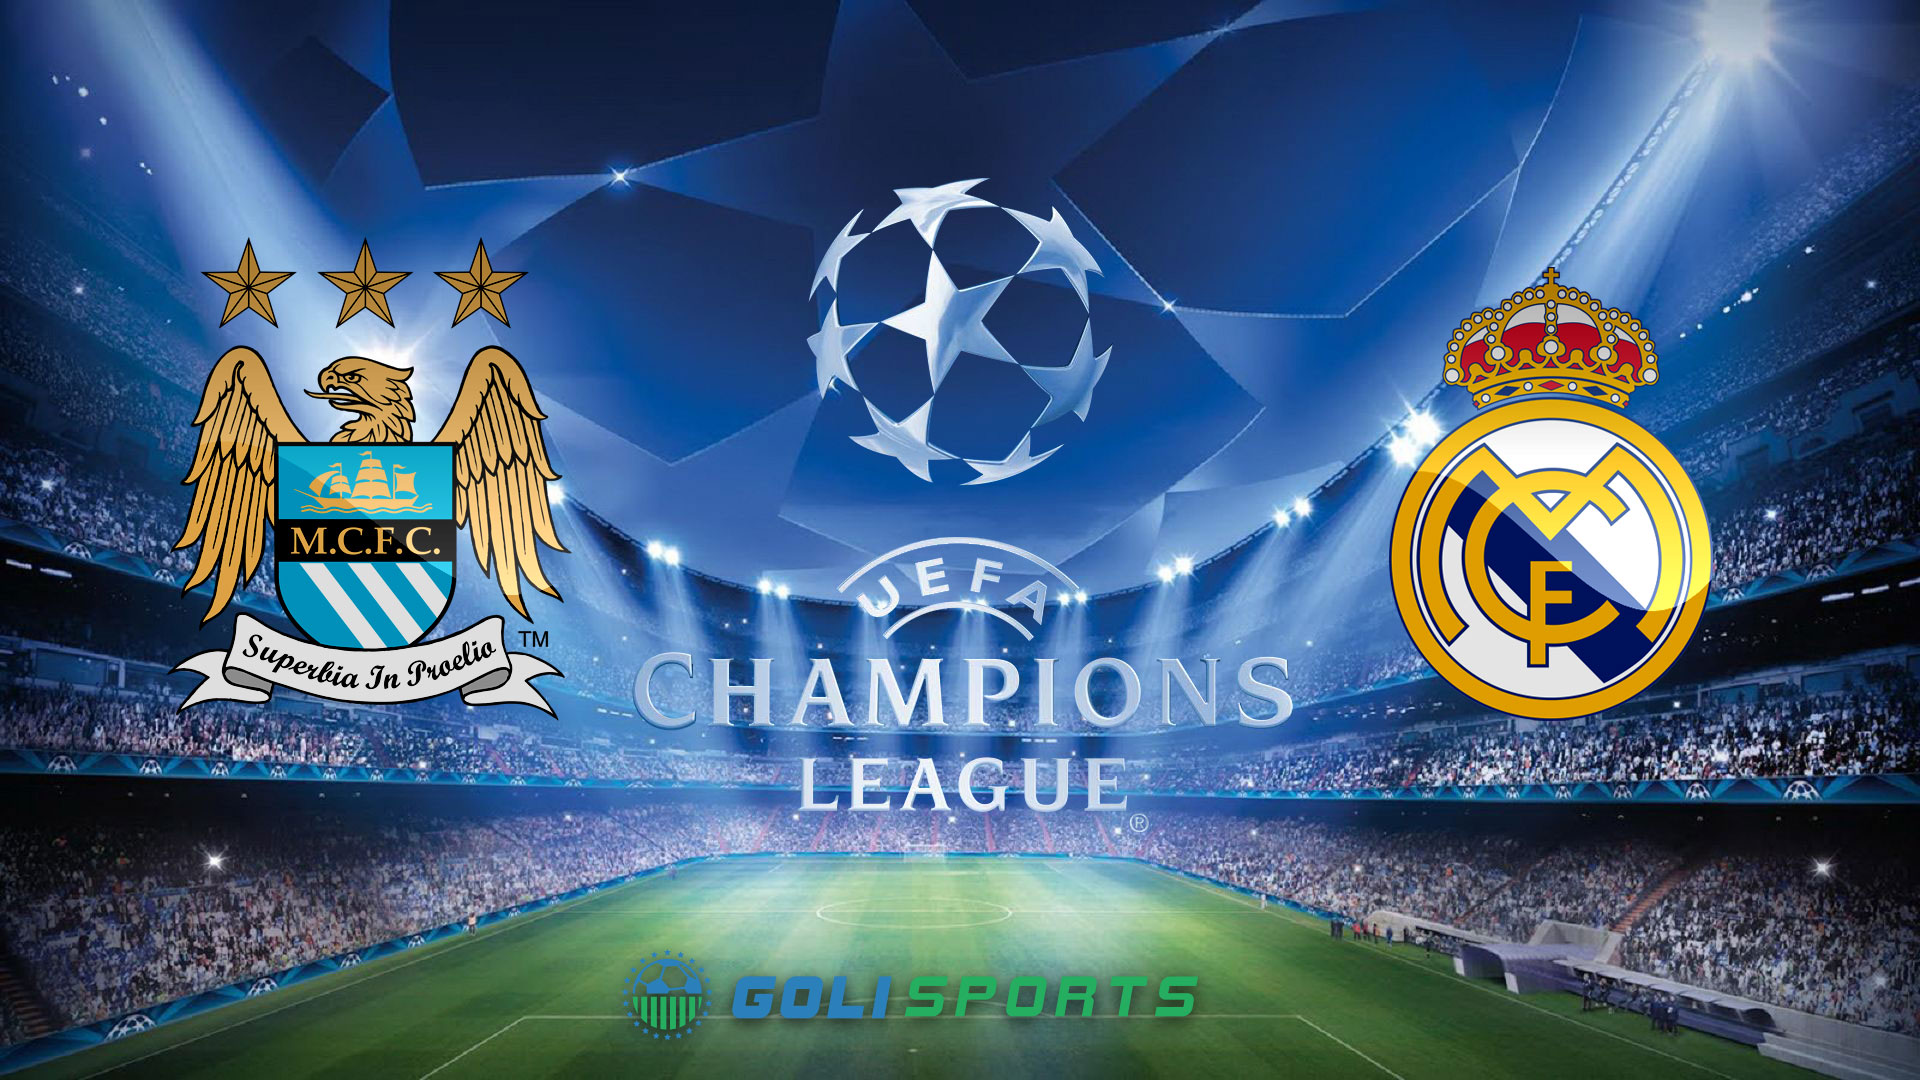 Champions League Man City VS Real Madrid Goli Sports